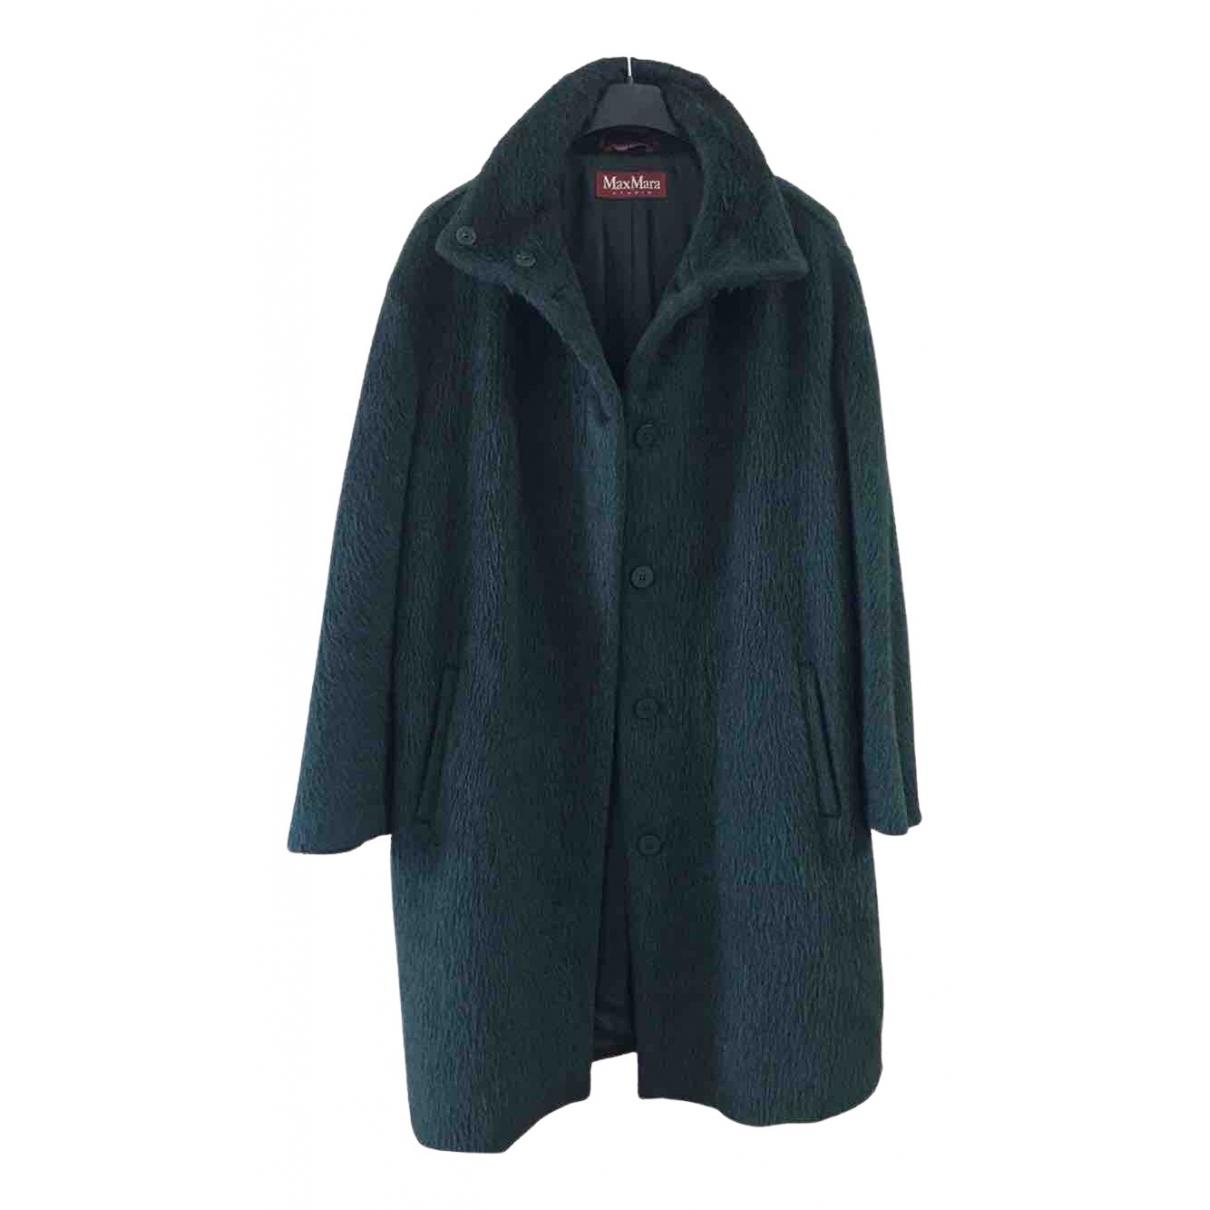 Max Mara Studio \N Green Wool coat for Women M International